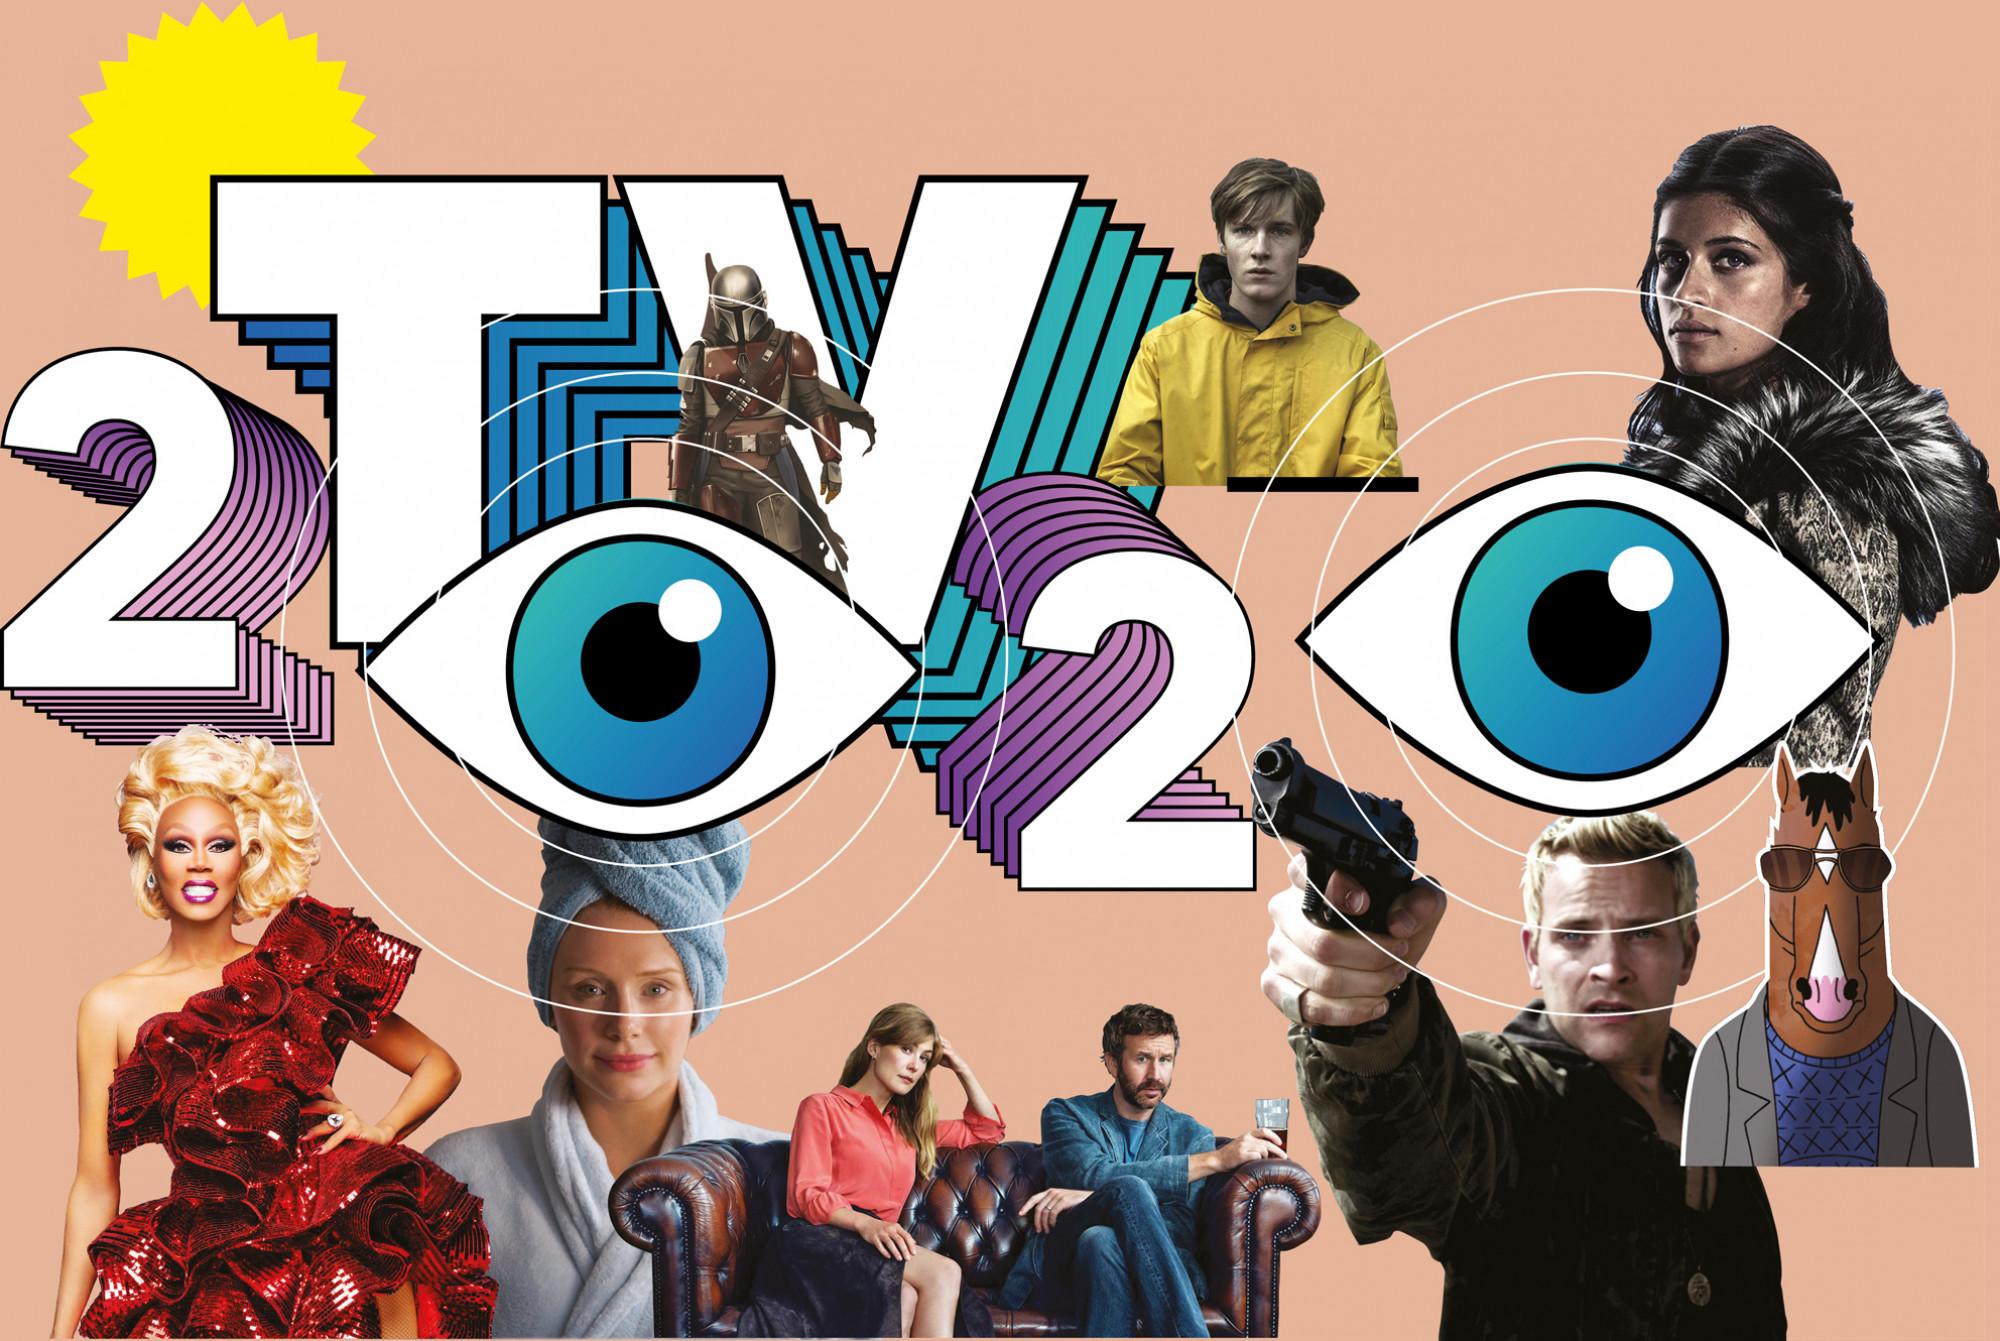 https://www.google.com/search?q=TV++Shows+2020%2C+%CE%95%CE%BB%CE%BB%CE%B1%CE%B4%CE%B1&tbm=isch&ved=2ahUKEwjnntbs8vXsAhXDRBQKHQDADiIQ2-cCegQIABAA&oq=TV++Shows+2020%2C+%CE%95%CE%BB%CE%BB%CE%B1%CE%B4%CE%B1&gs_lcp=CgNpbWcQAzoECCMQJzoECAAQEzoGCAAQHhATOggIABAFEB4QE1CvQlj0YmCxY2gCcAB4AIABjAKIAf0IkgEFMC4xLjSYAQCgAQGqAQtnd3Mtd2l6LWltZ8ABAQ&sclient=img&ei=SHCpX-faO8OJUYCAu5AC&bih=666&biw=1536#imgrc=_OnWVdG_jVV3VM